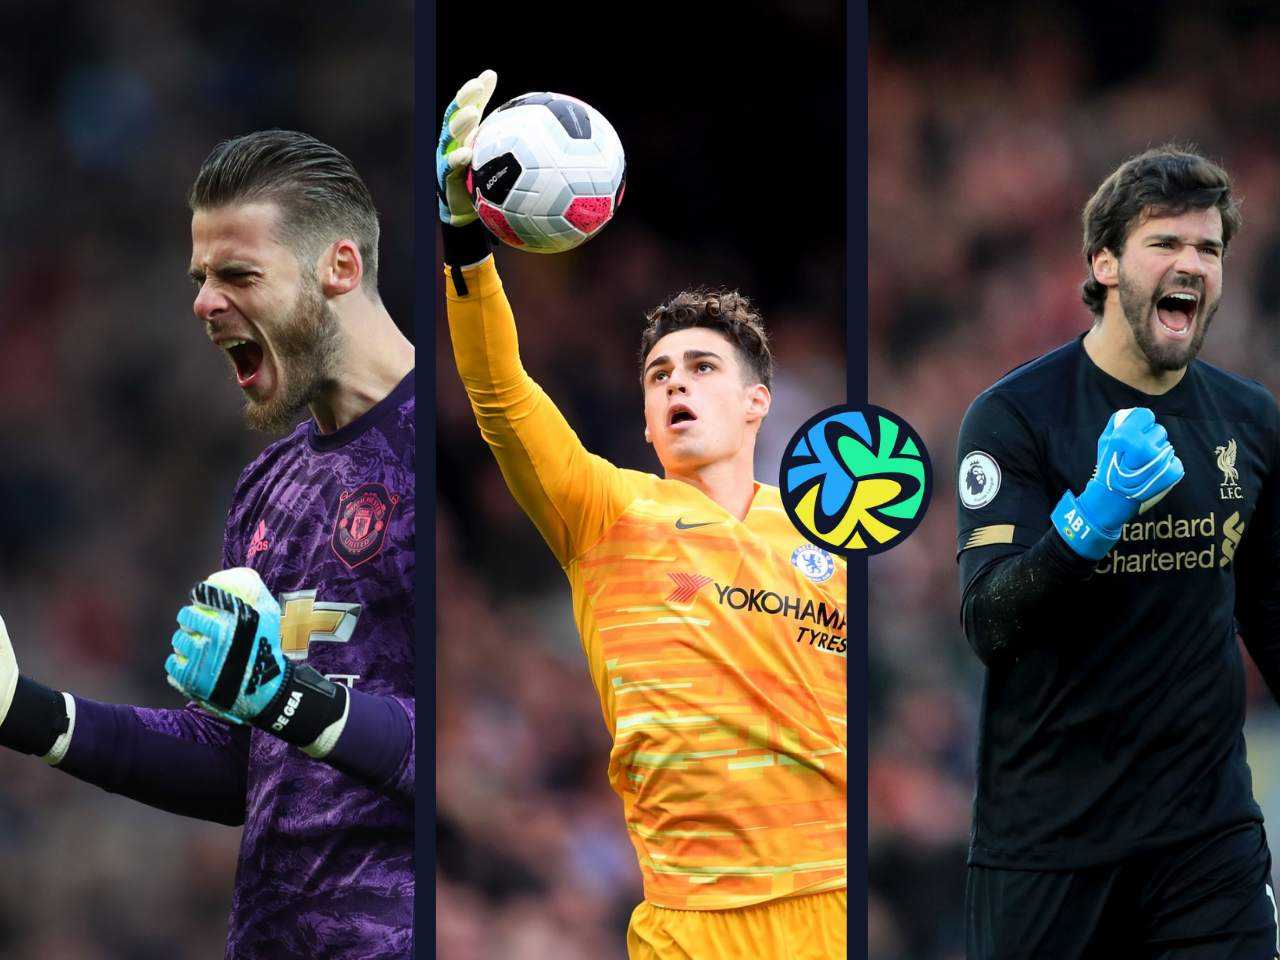 David De Gea of Manchester United, Kepa Arrizabalaga of Chelsea, Alisson Becker of Liverpool